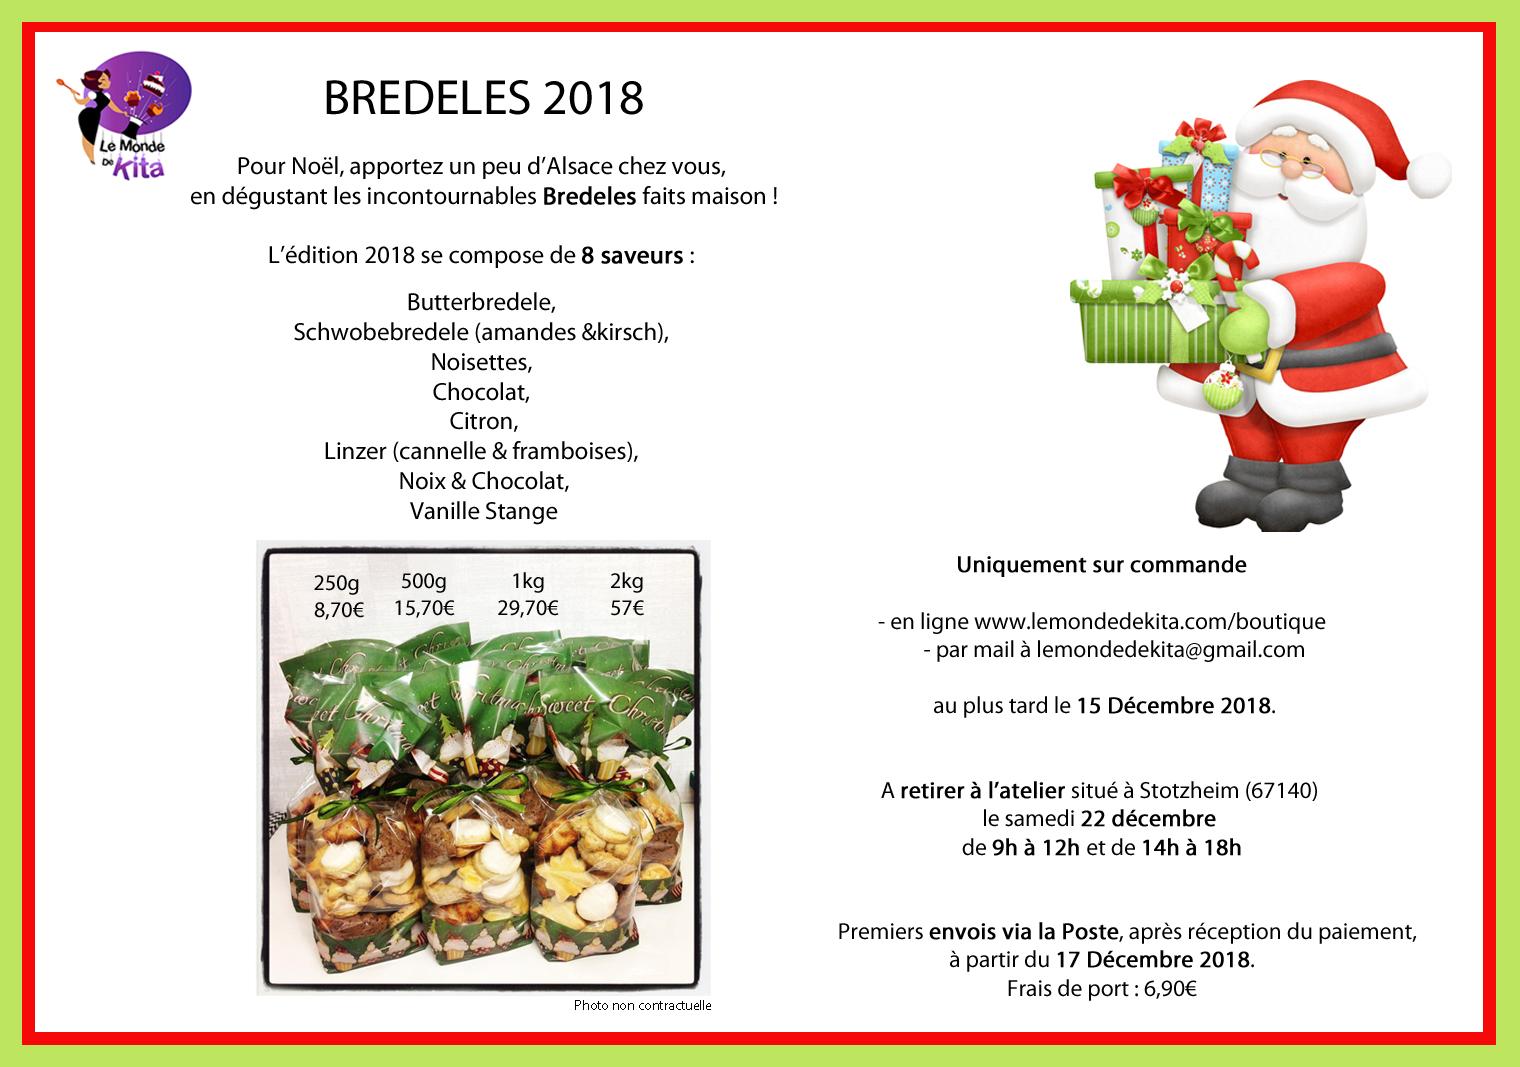 Bredele Noël 2018